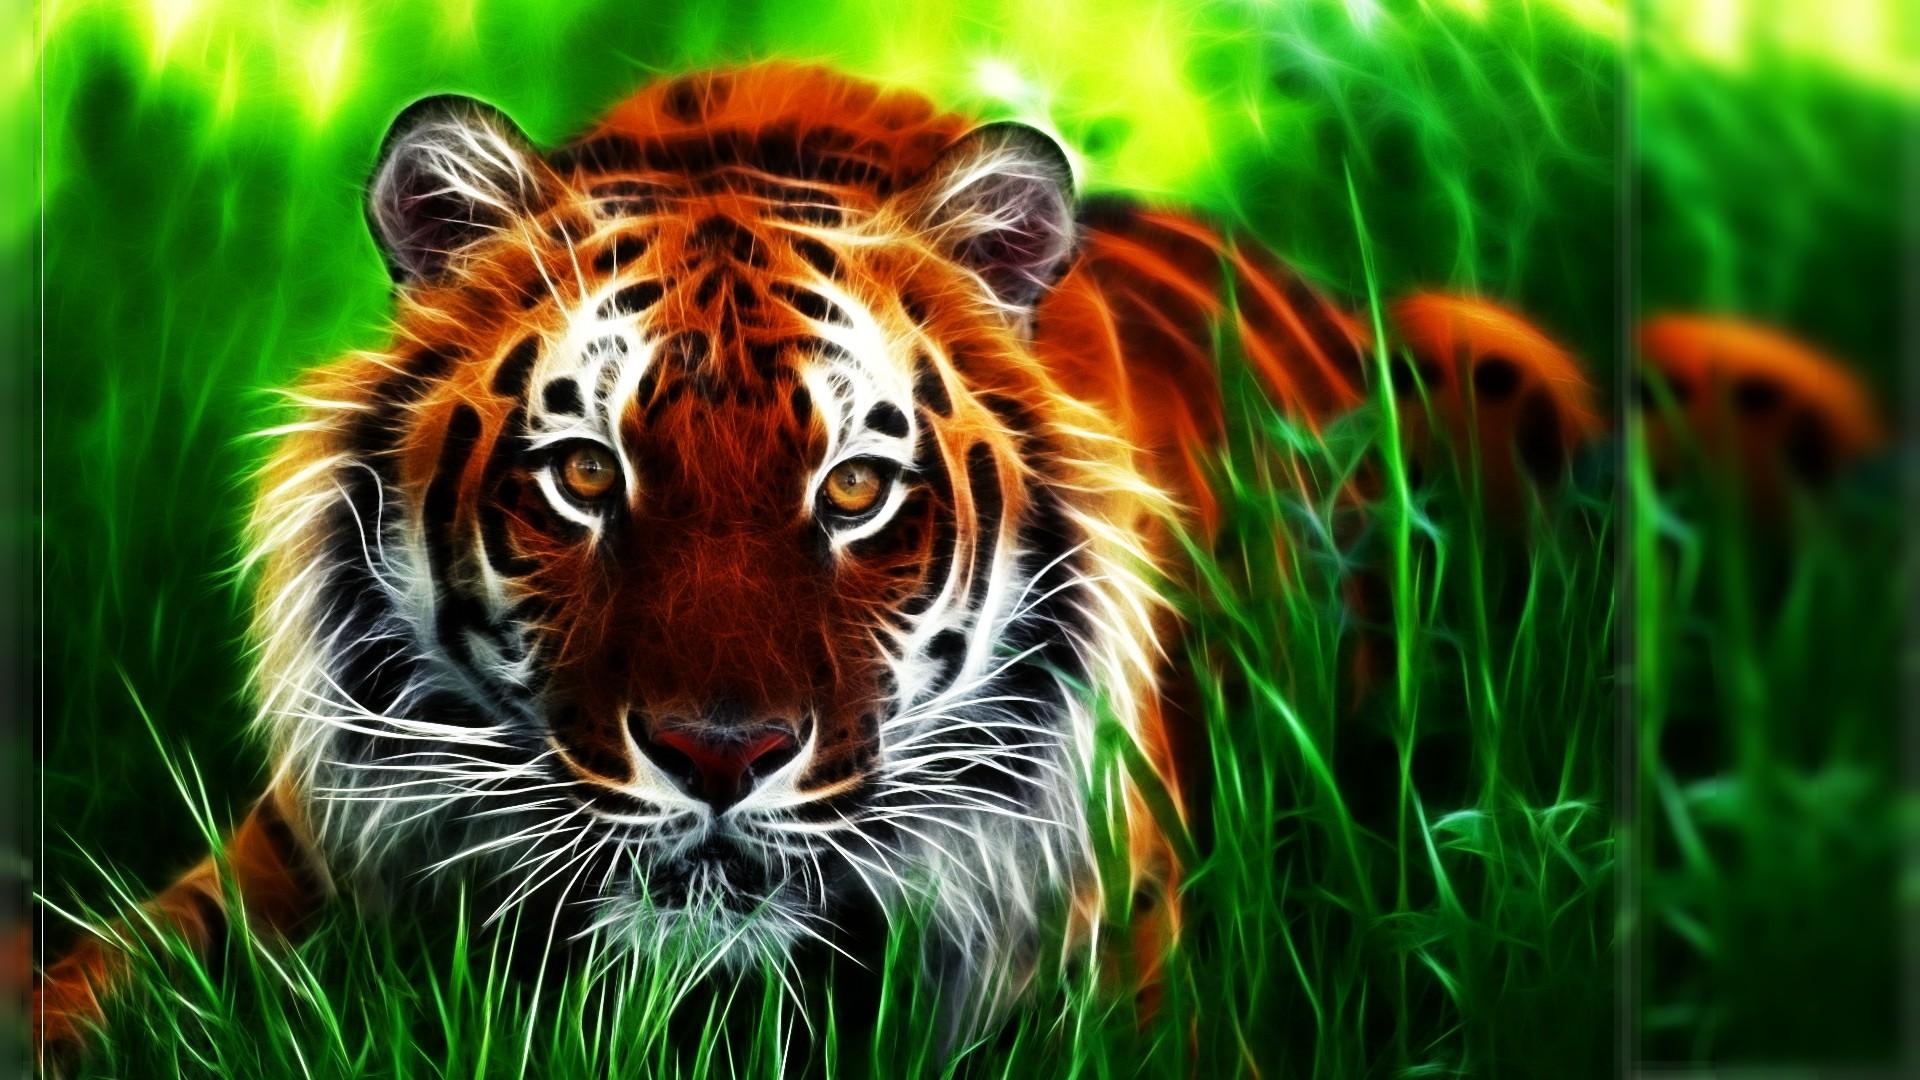 tiger wallpaper widescreen - photo #24